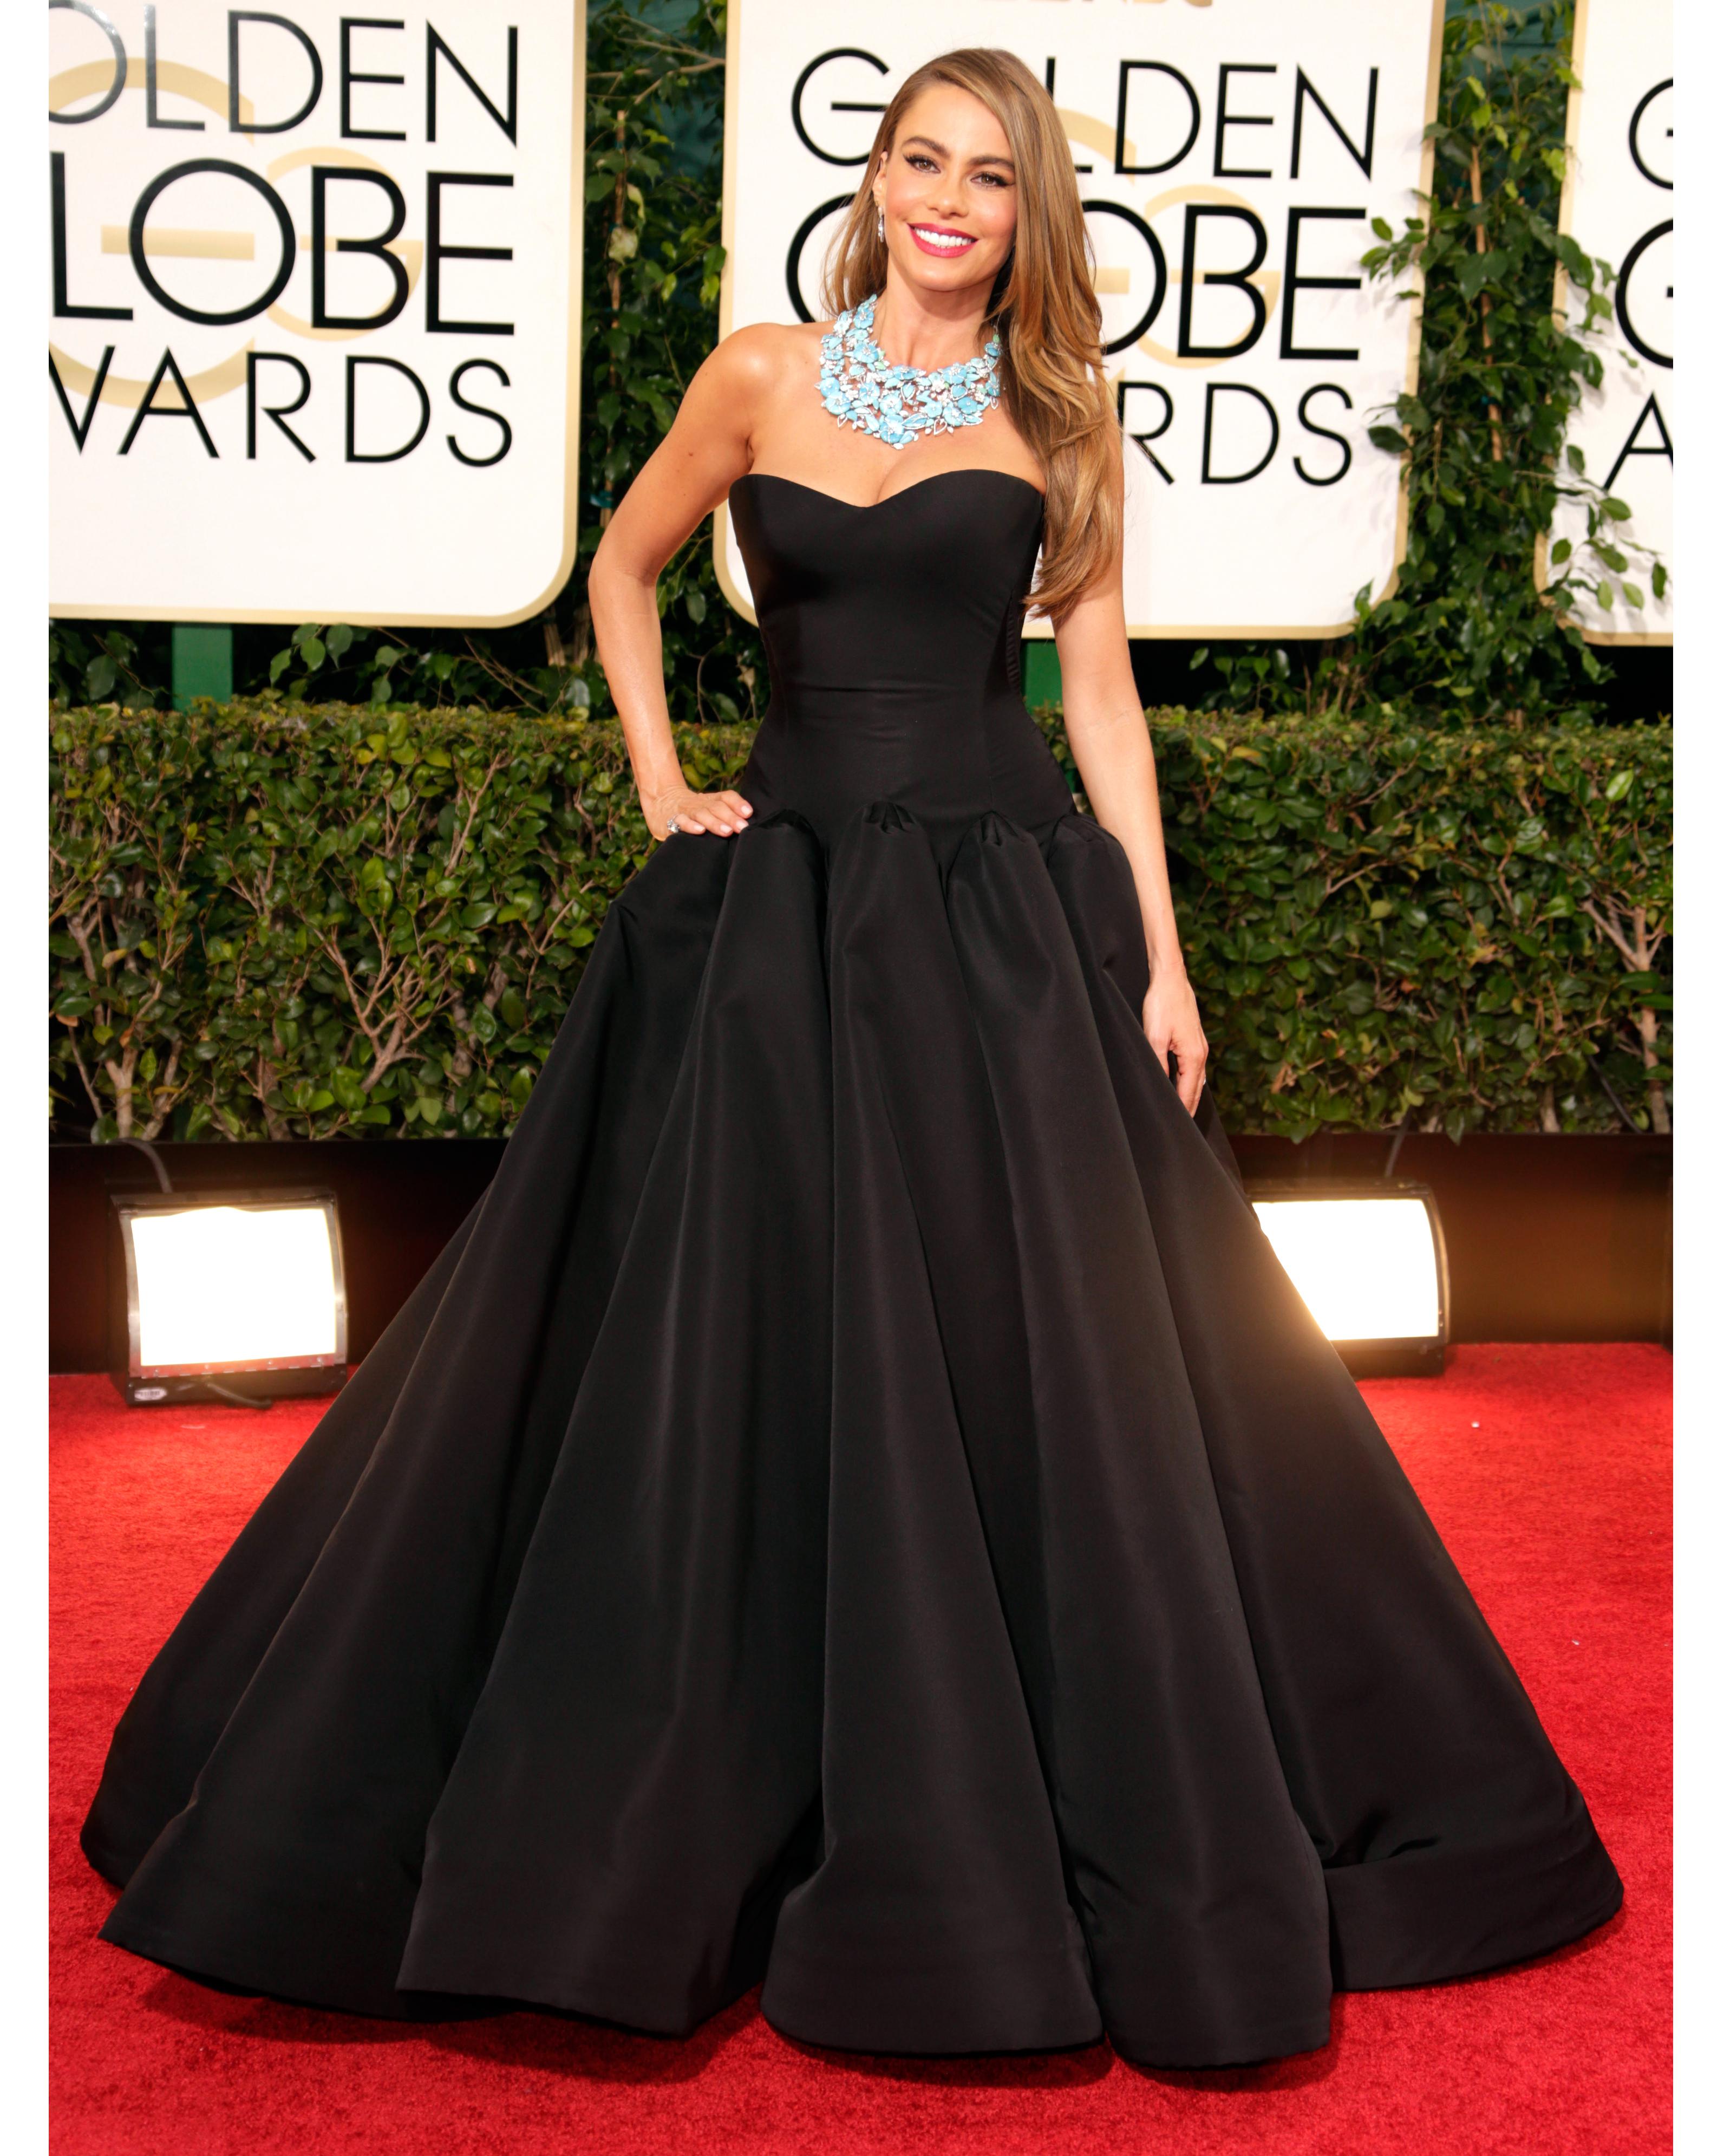 sofia-vergara-red-carpet-golden-globes-zac-posen-black-gown-0815.jpg